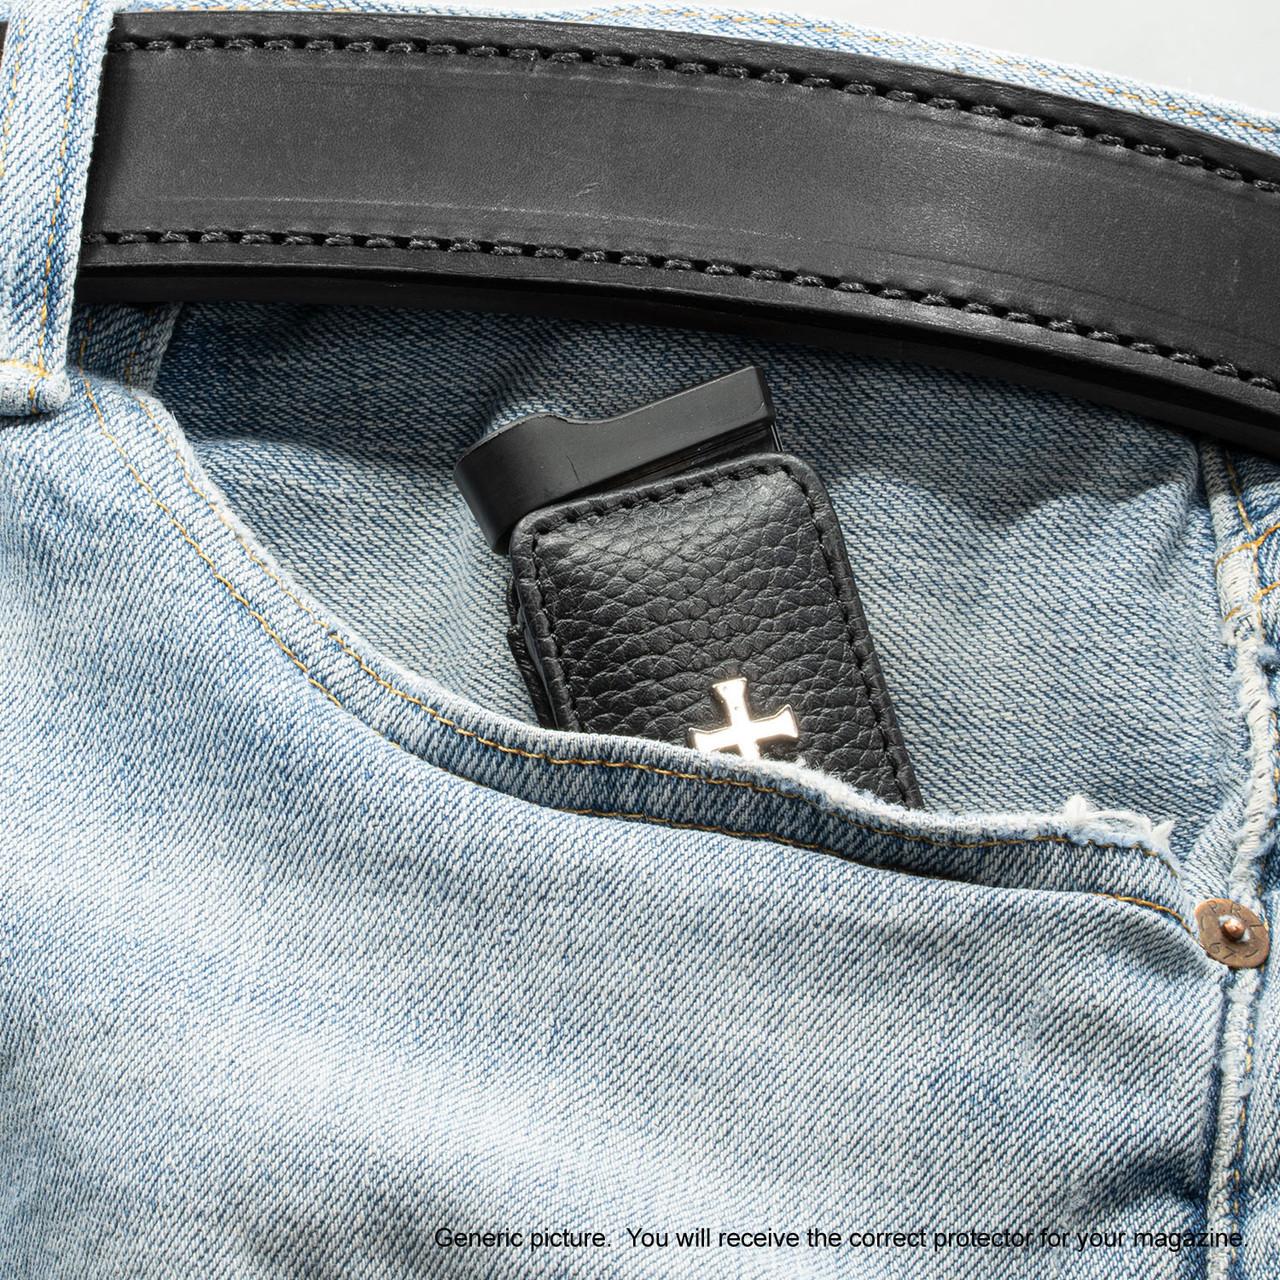 Sphinx SDP Compact Black Cross Magazine Pocket Protector